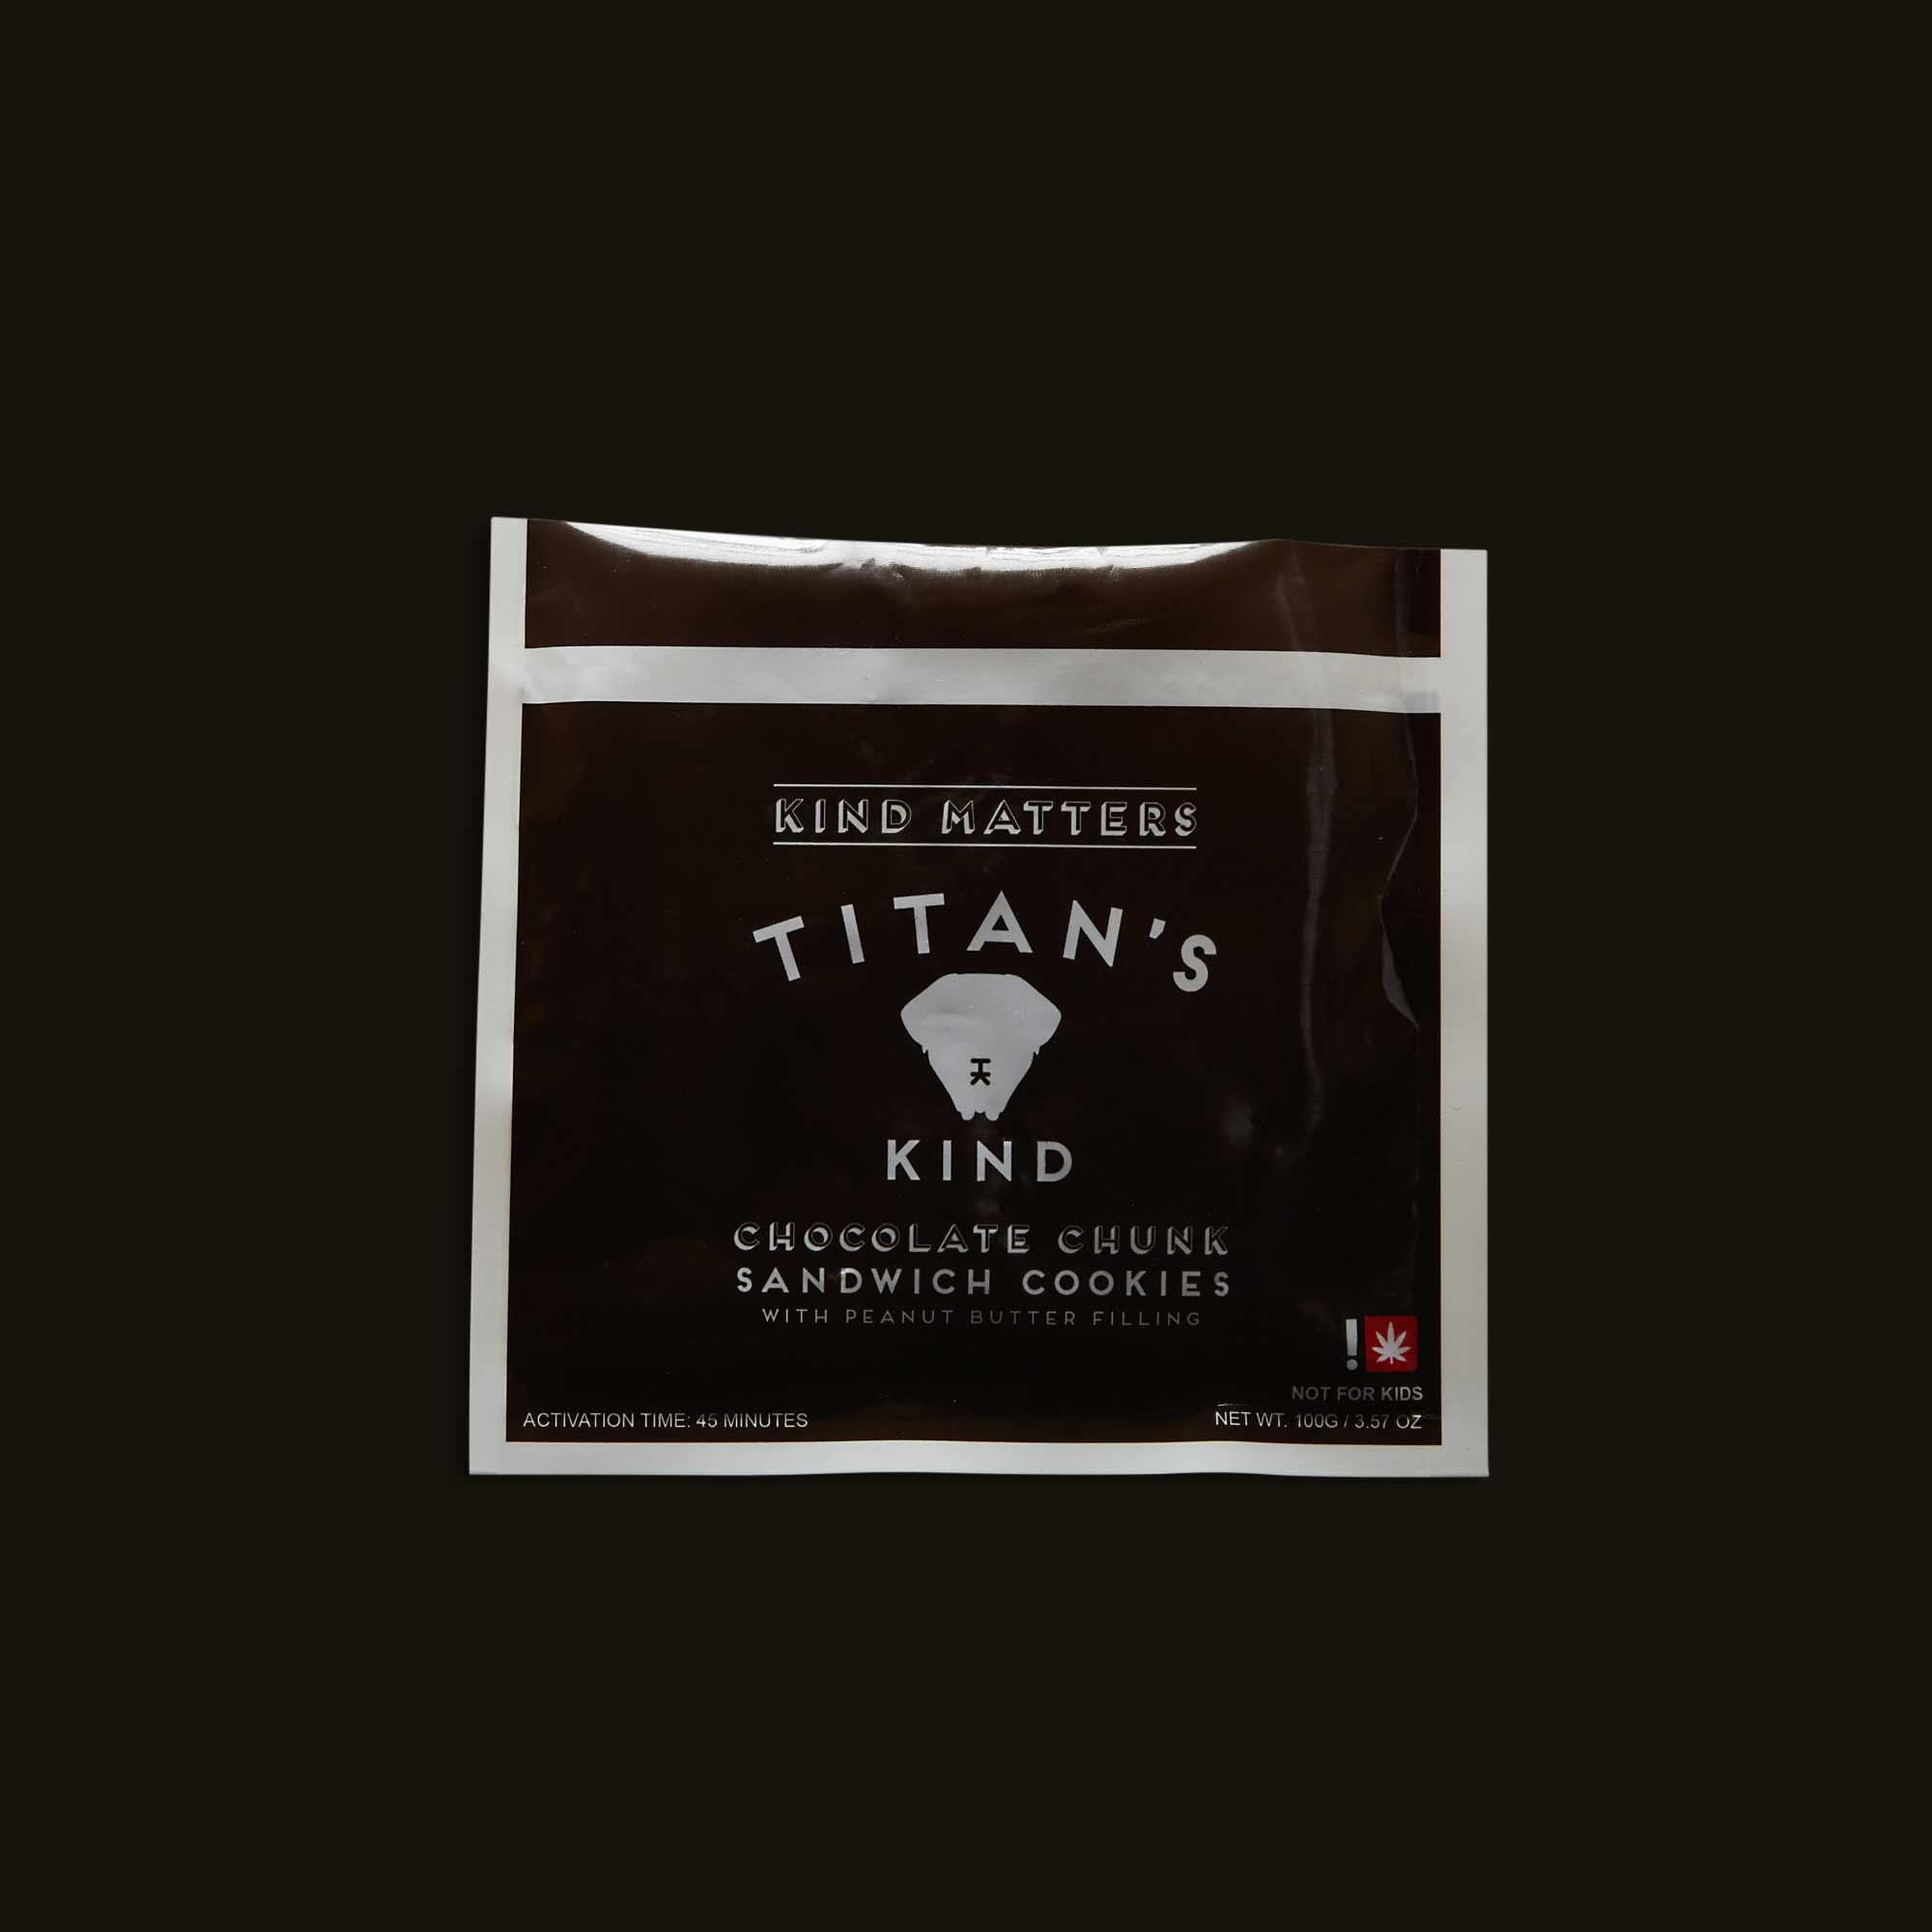 Titan's Kind Chocolate Chunk Sandwich Cookies